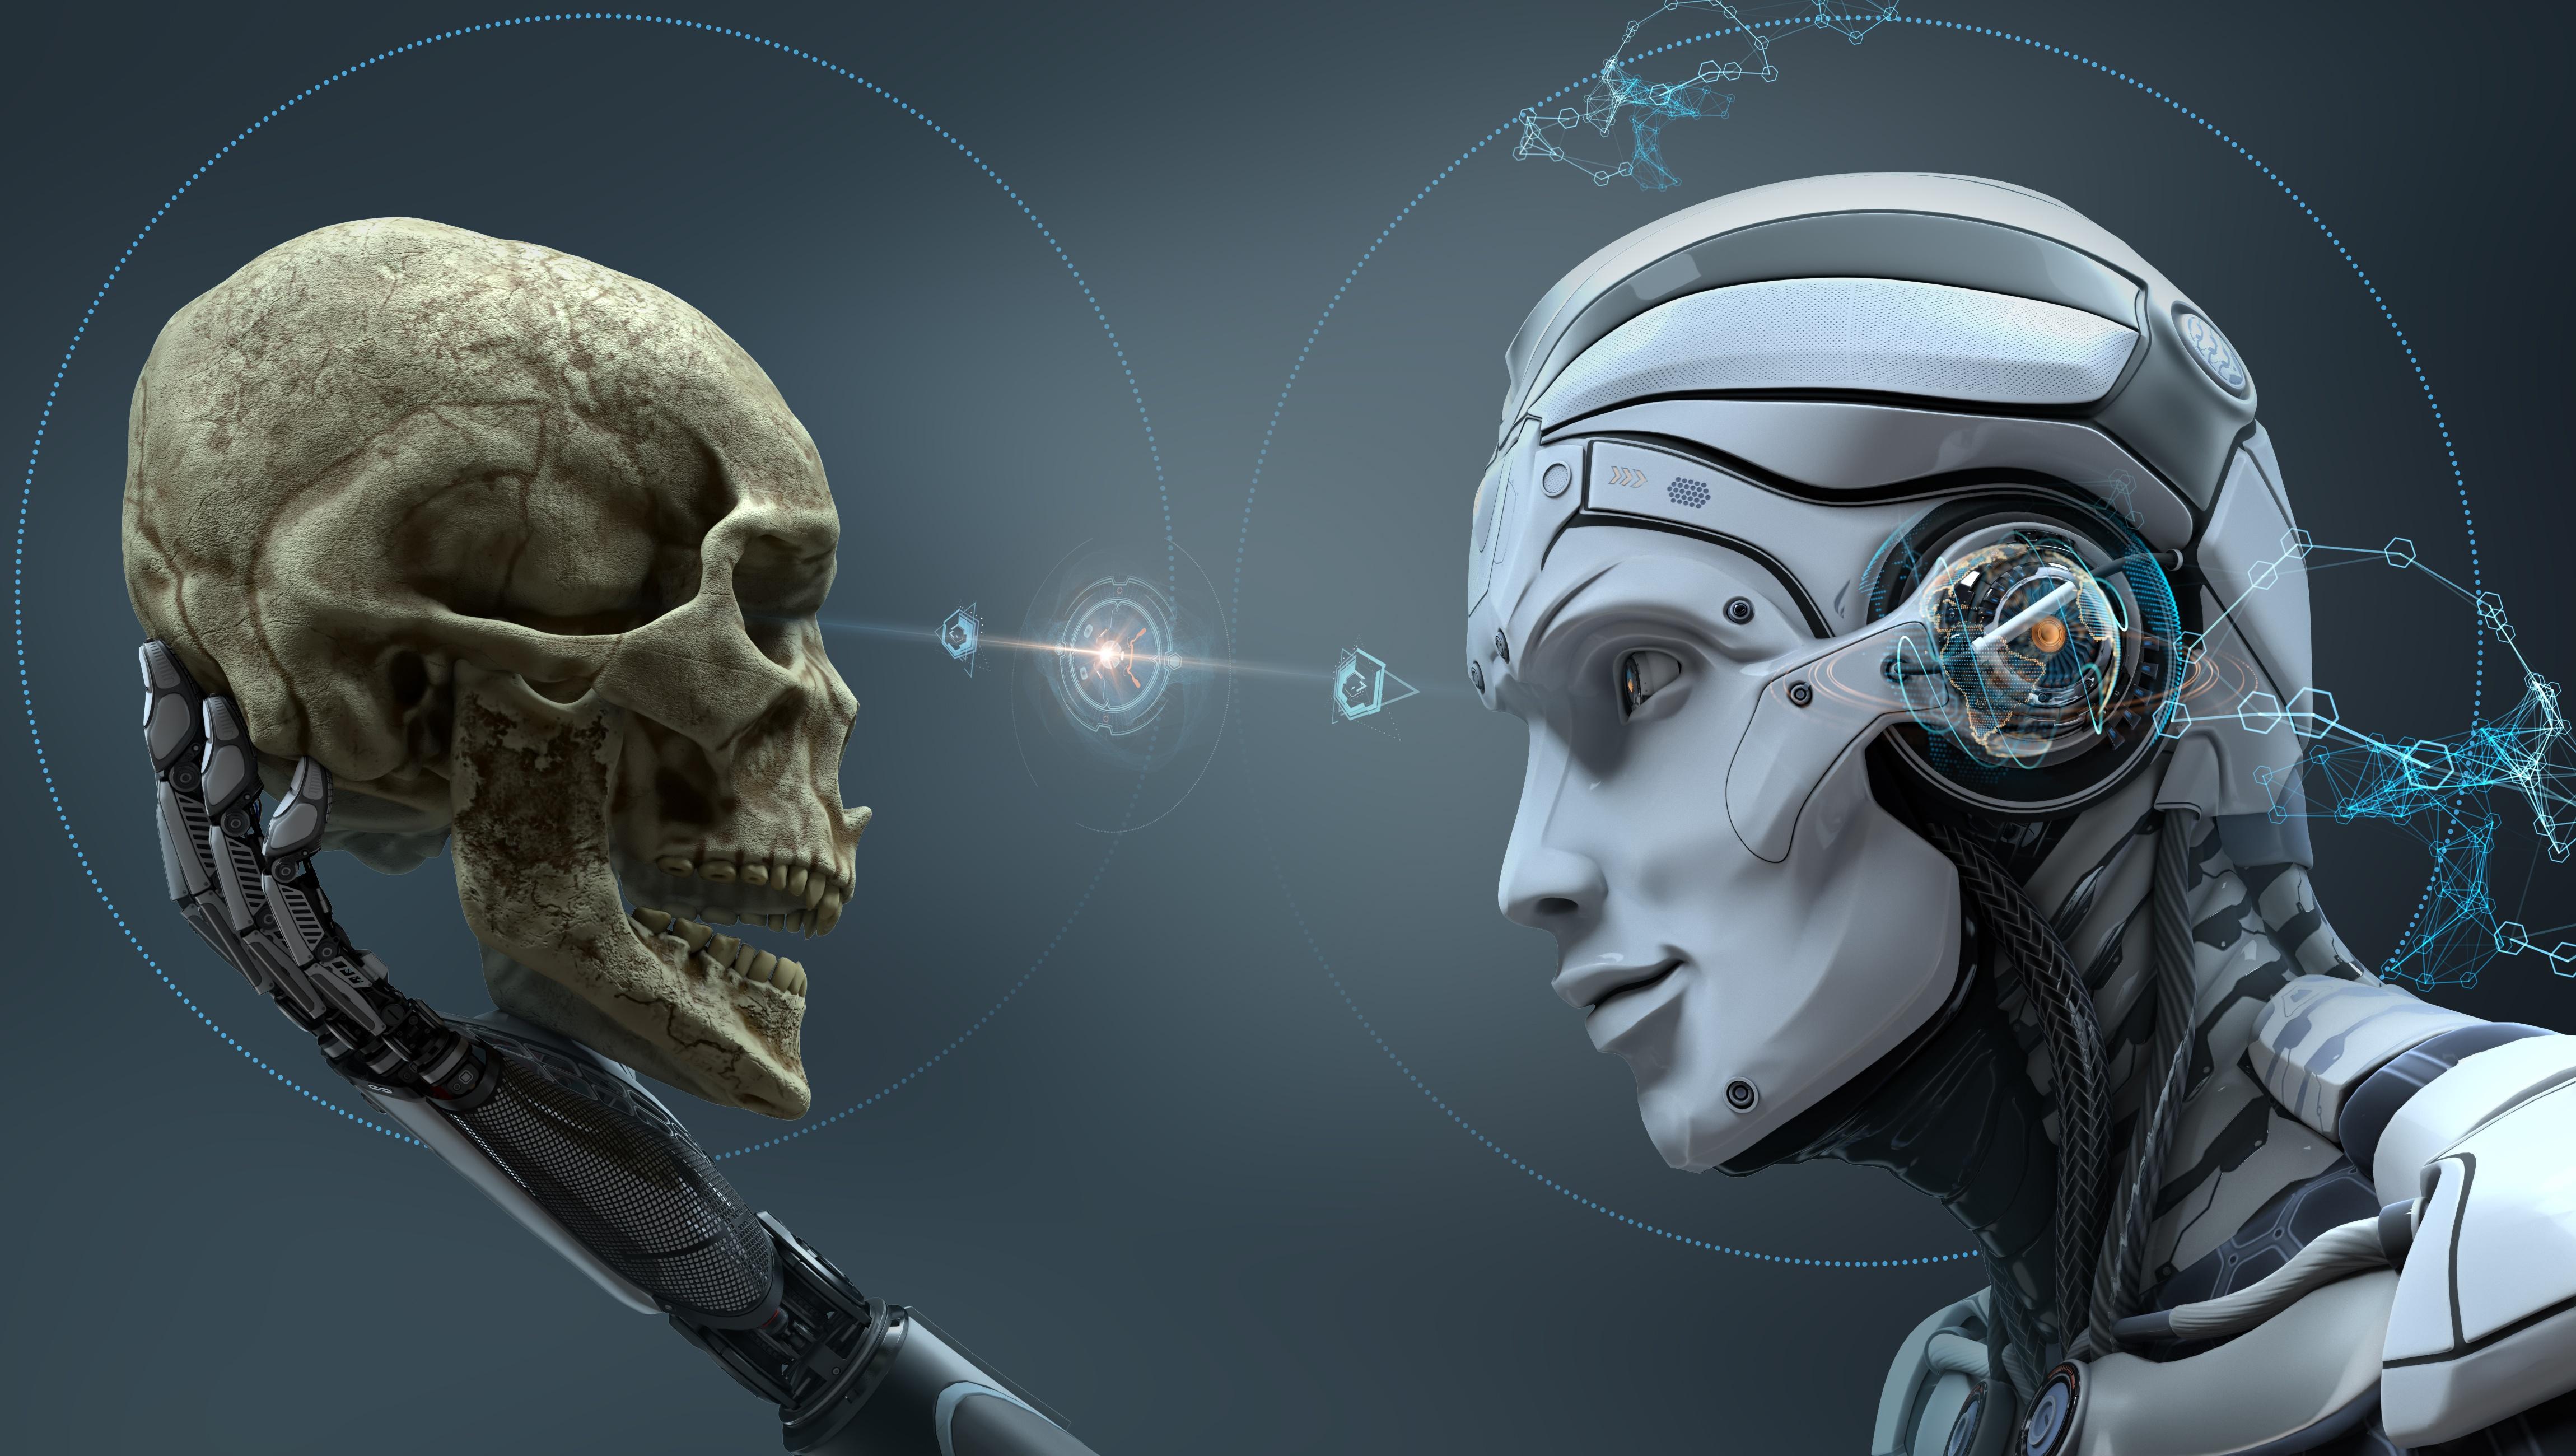 General 4600x2600 digital art skull machine robot